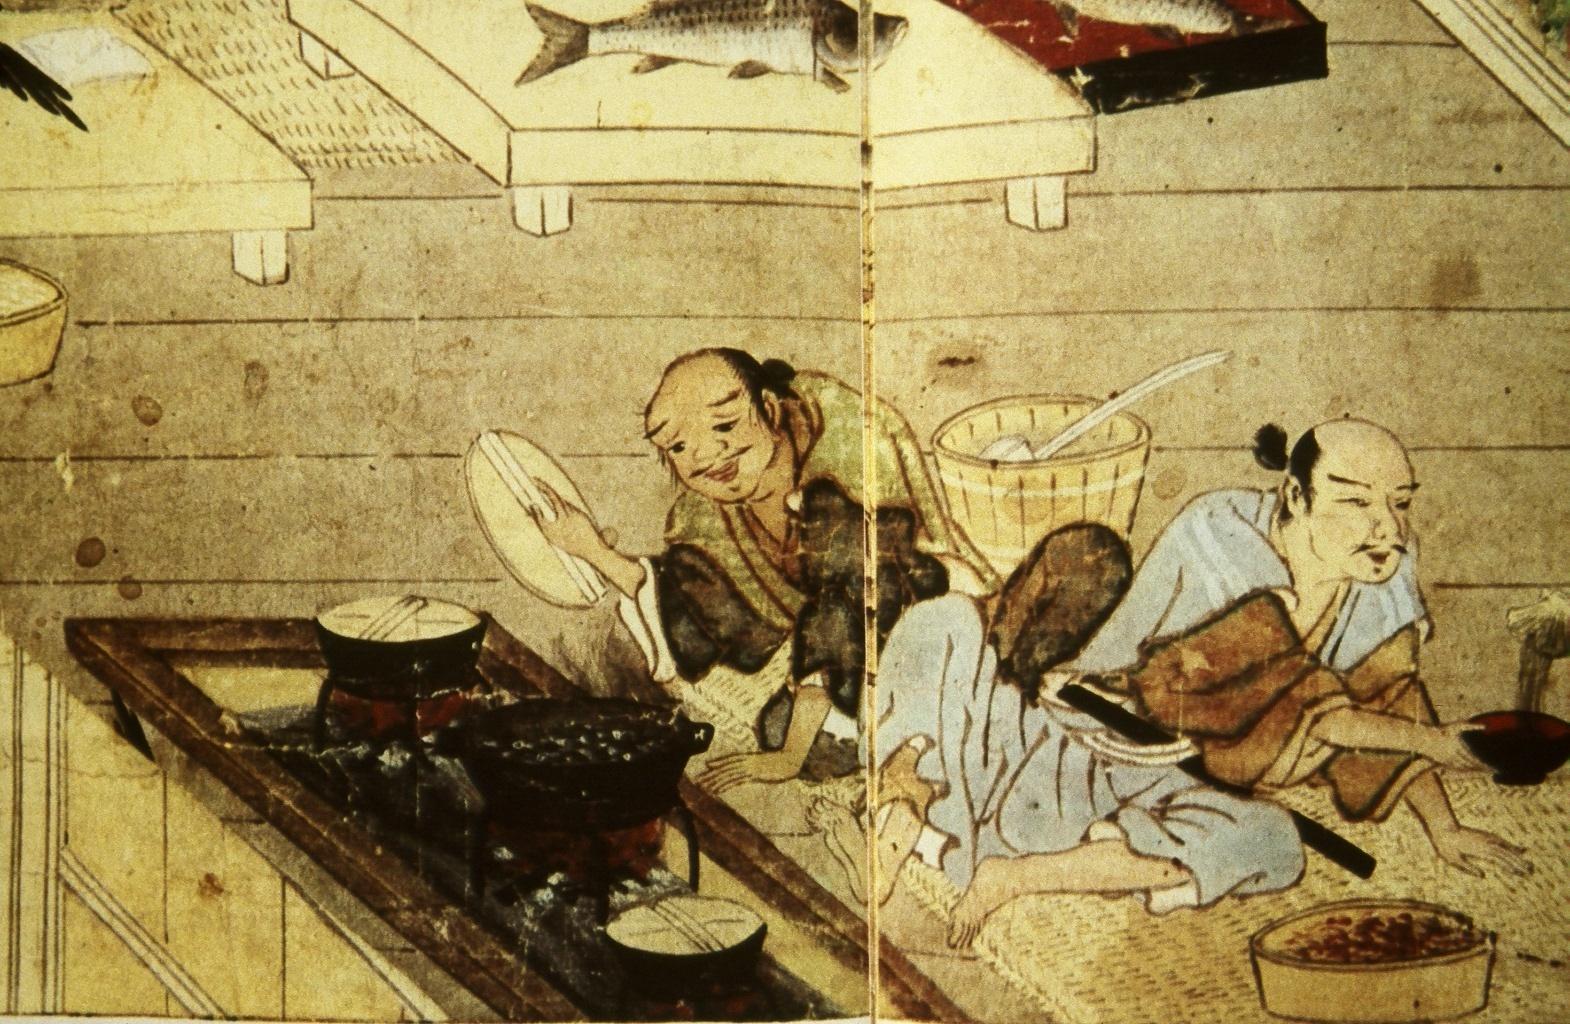 Otoshi-buta Dropped Lids